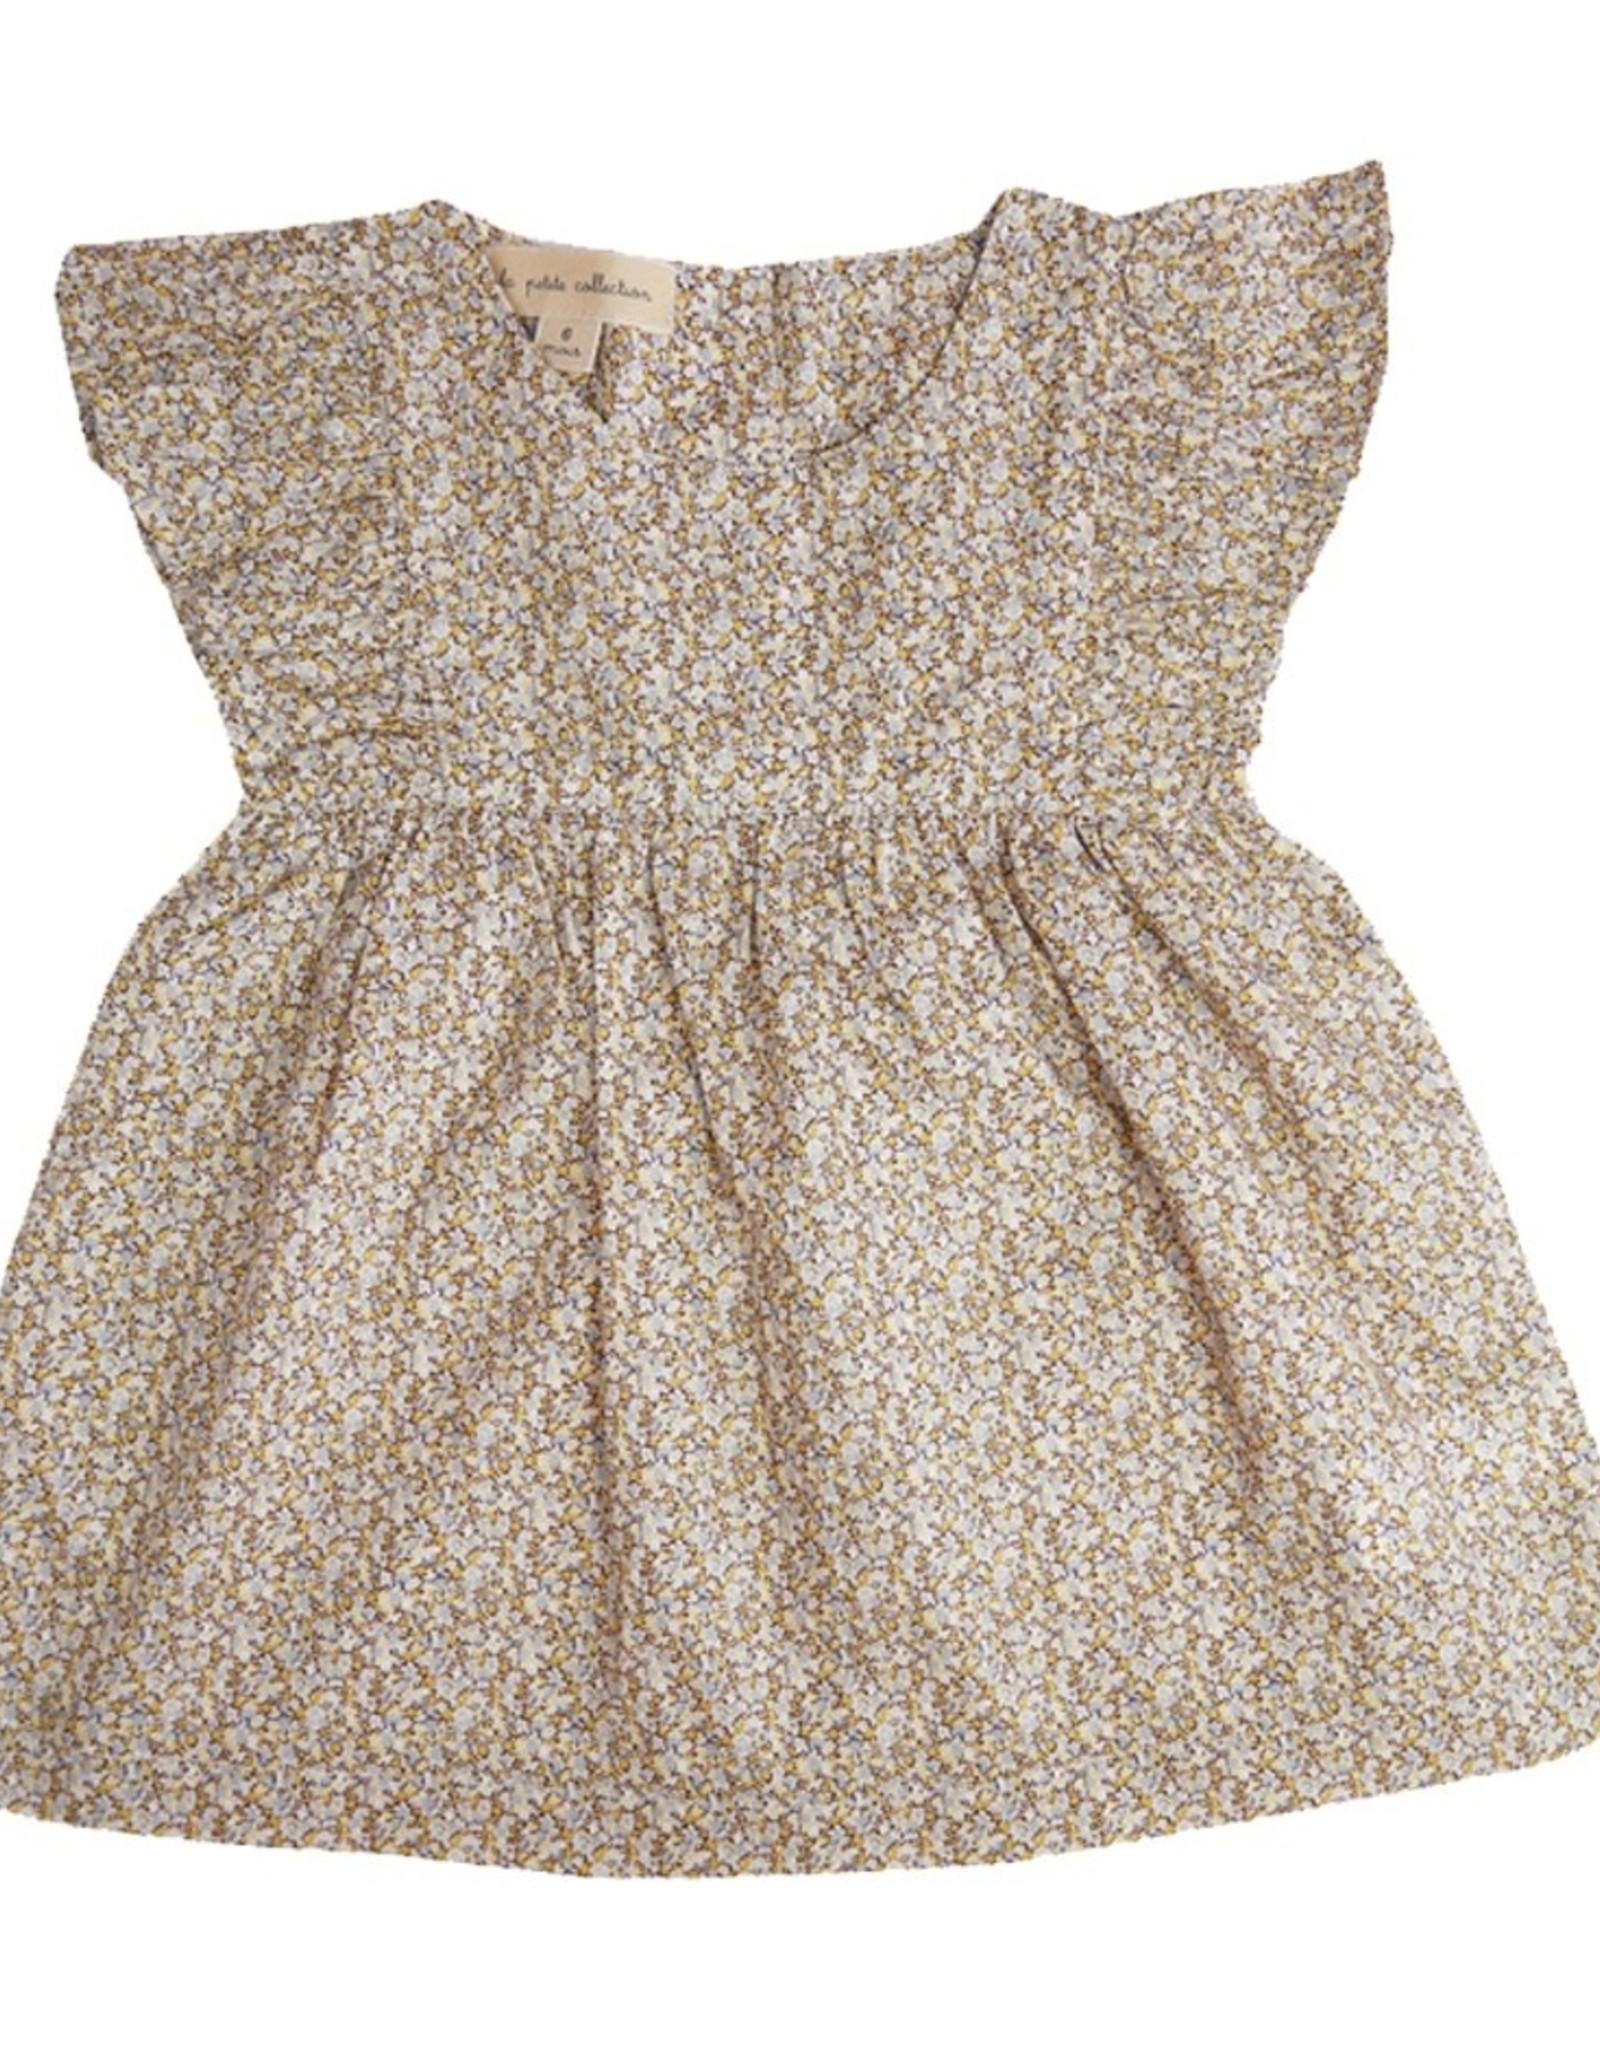 La Petite Collection Pepper dress, Liberty print